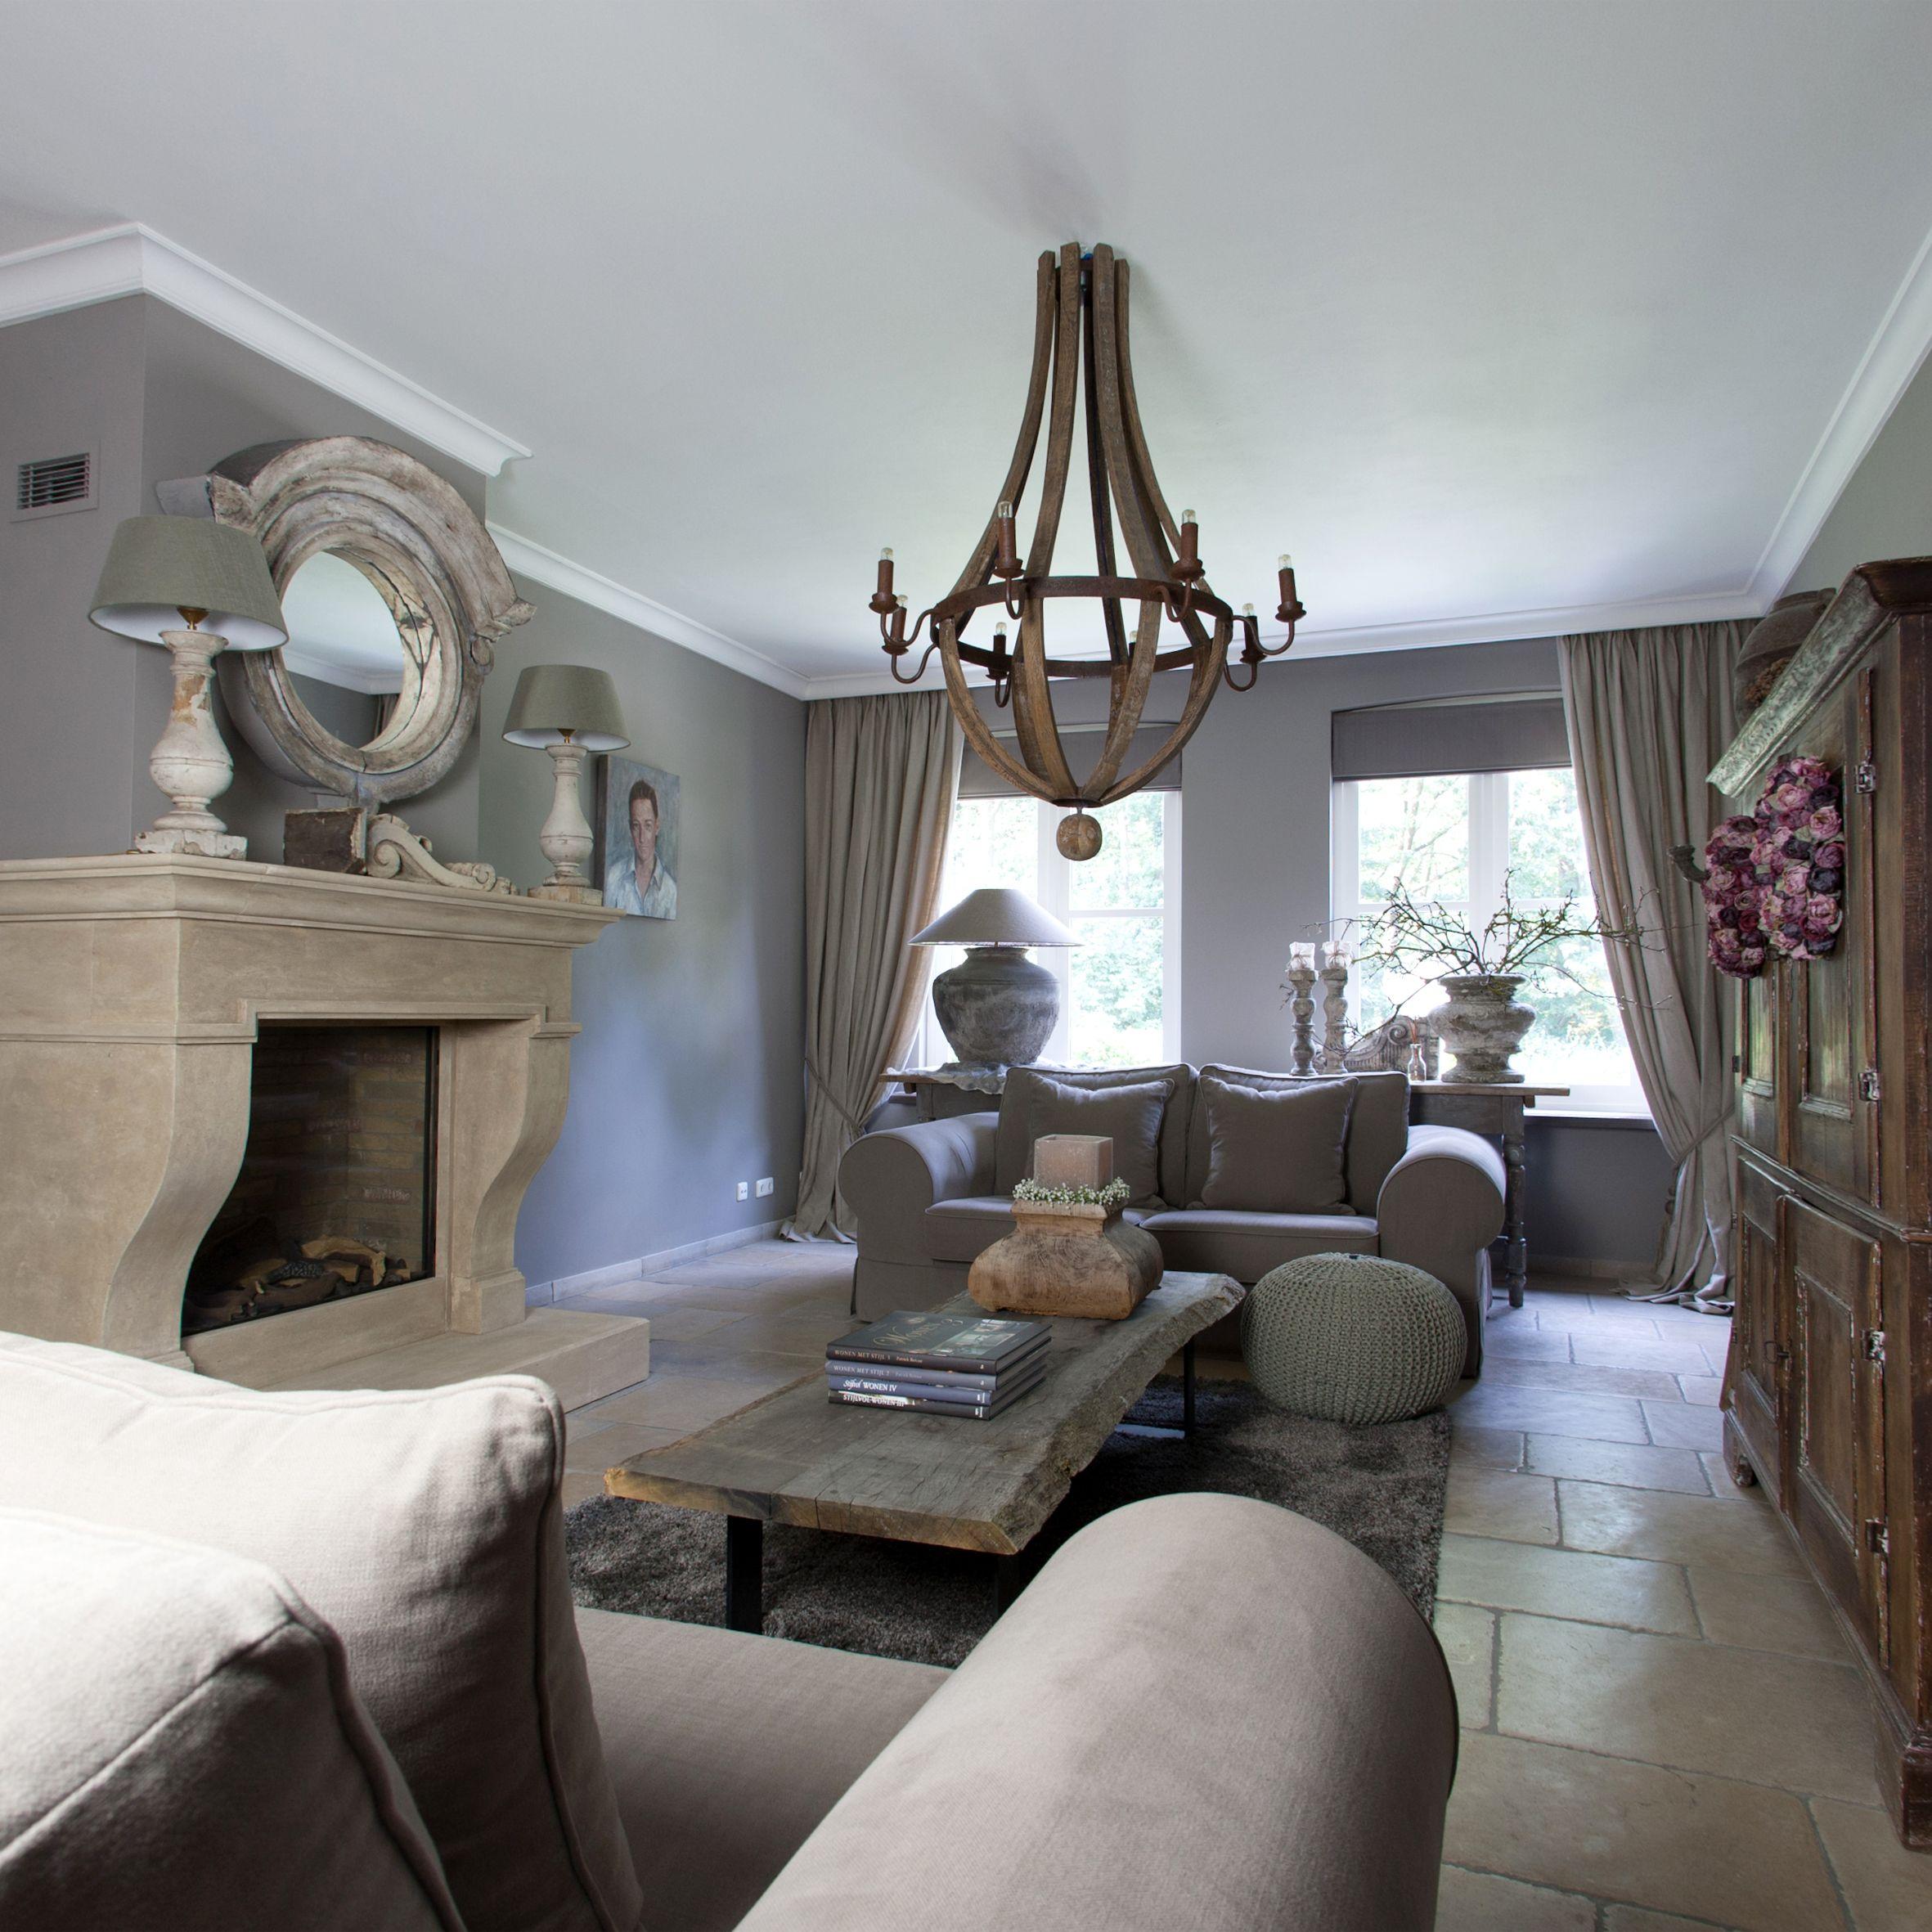 belgium gray walls, stone floors, light fixture